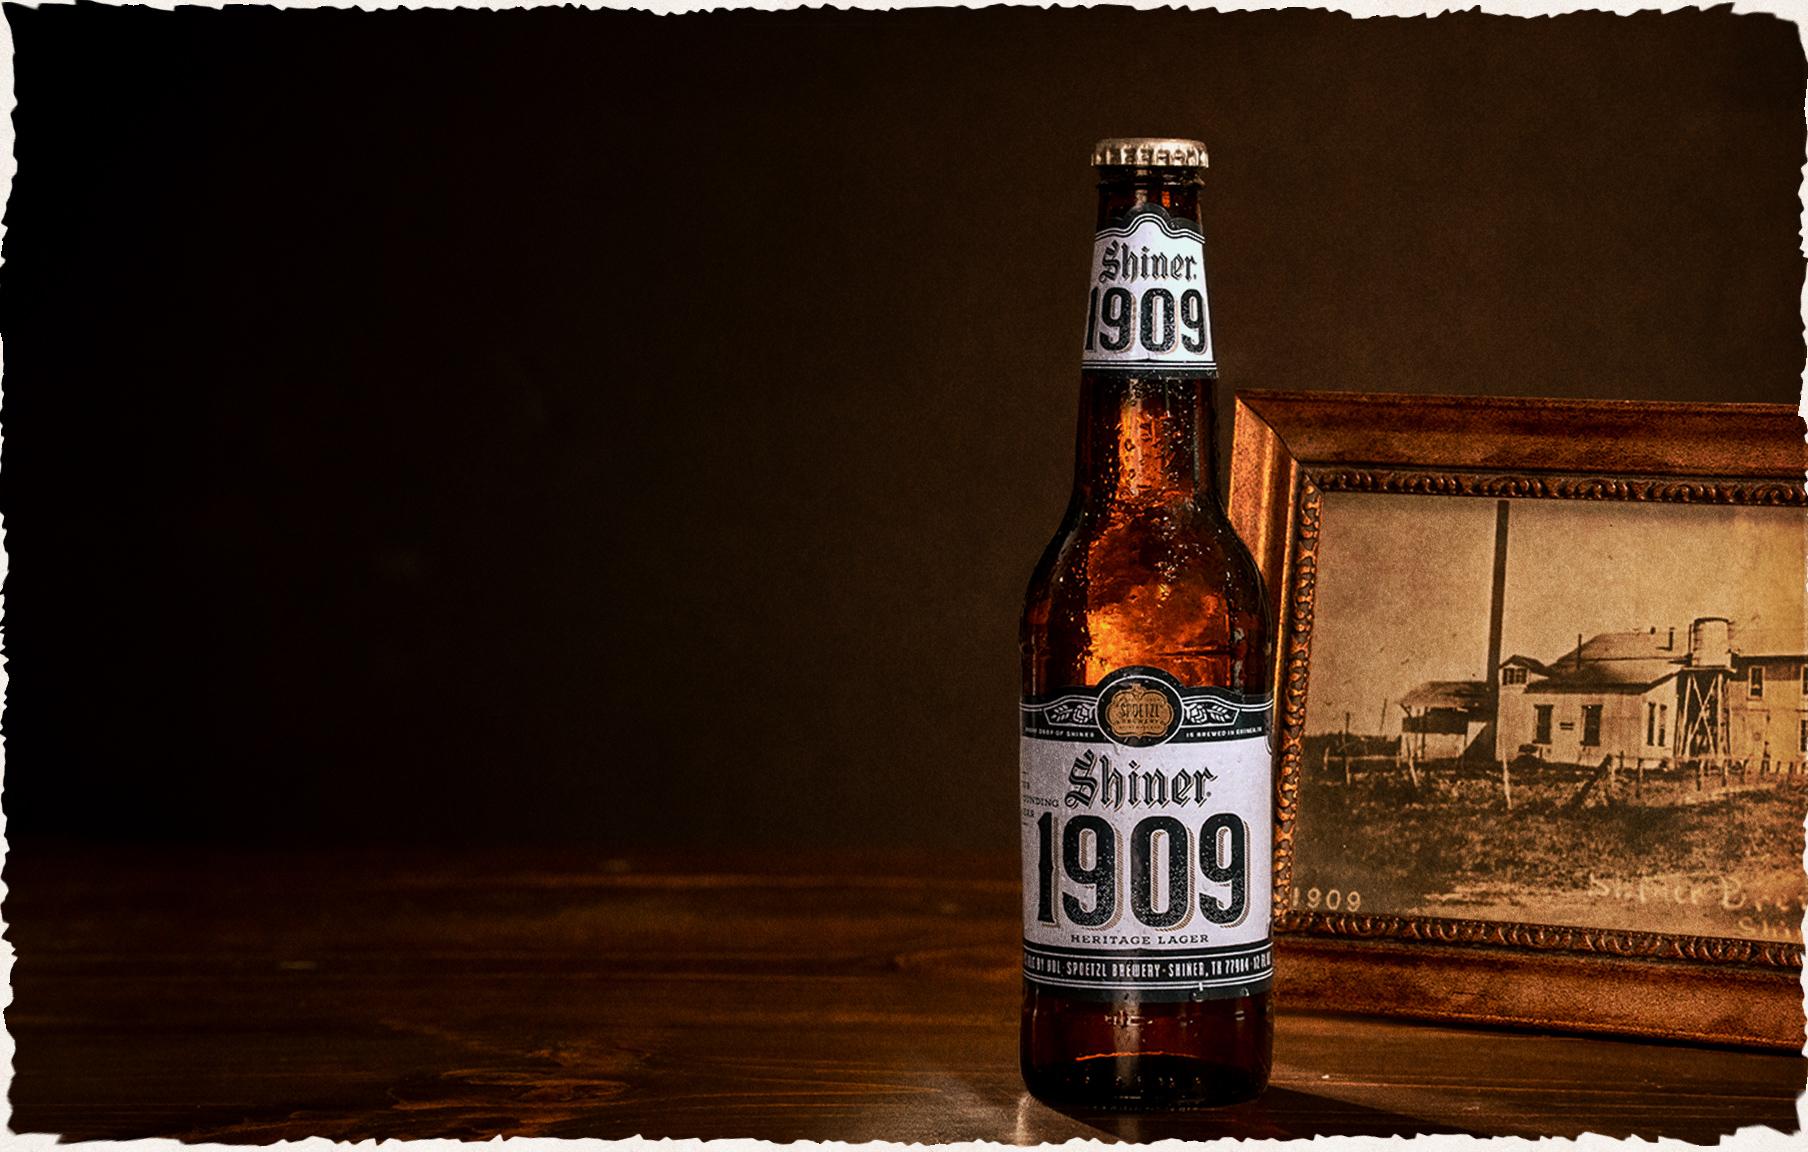 Shiner 1909